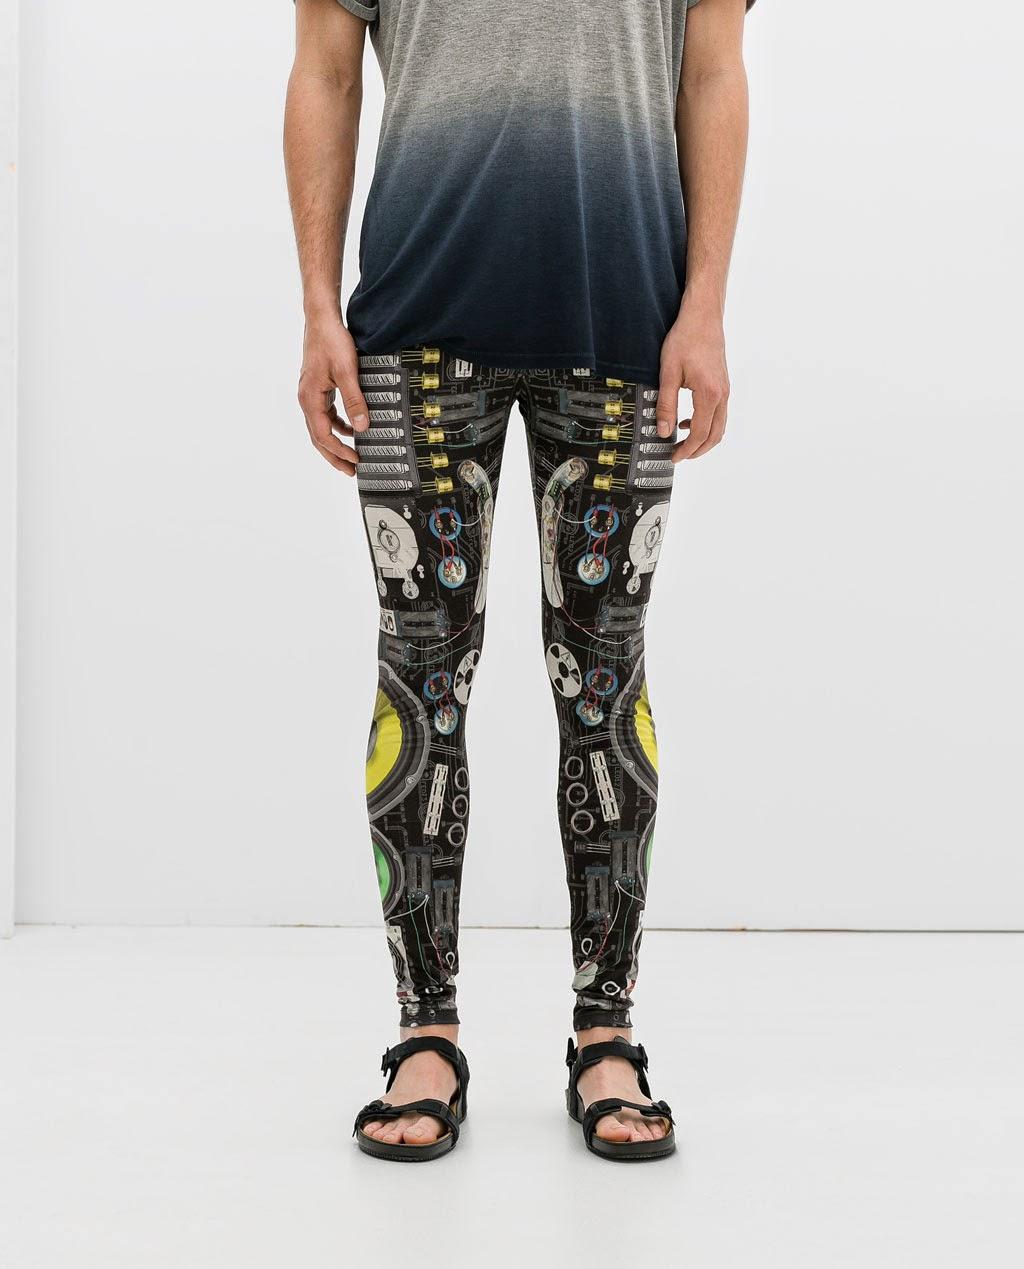 Legging disco, Zara 15,99 \u20ac